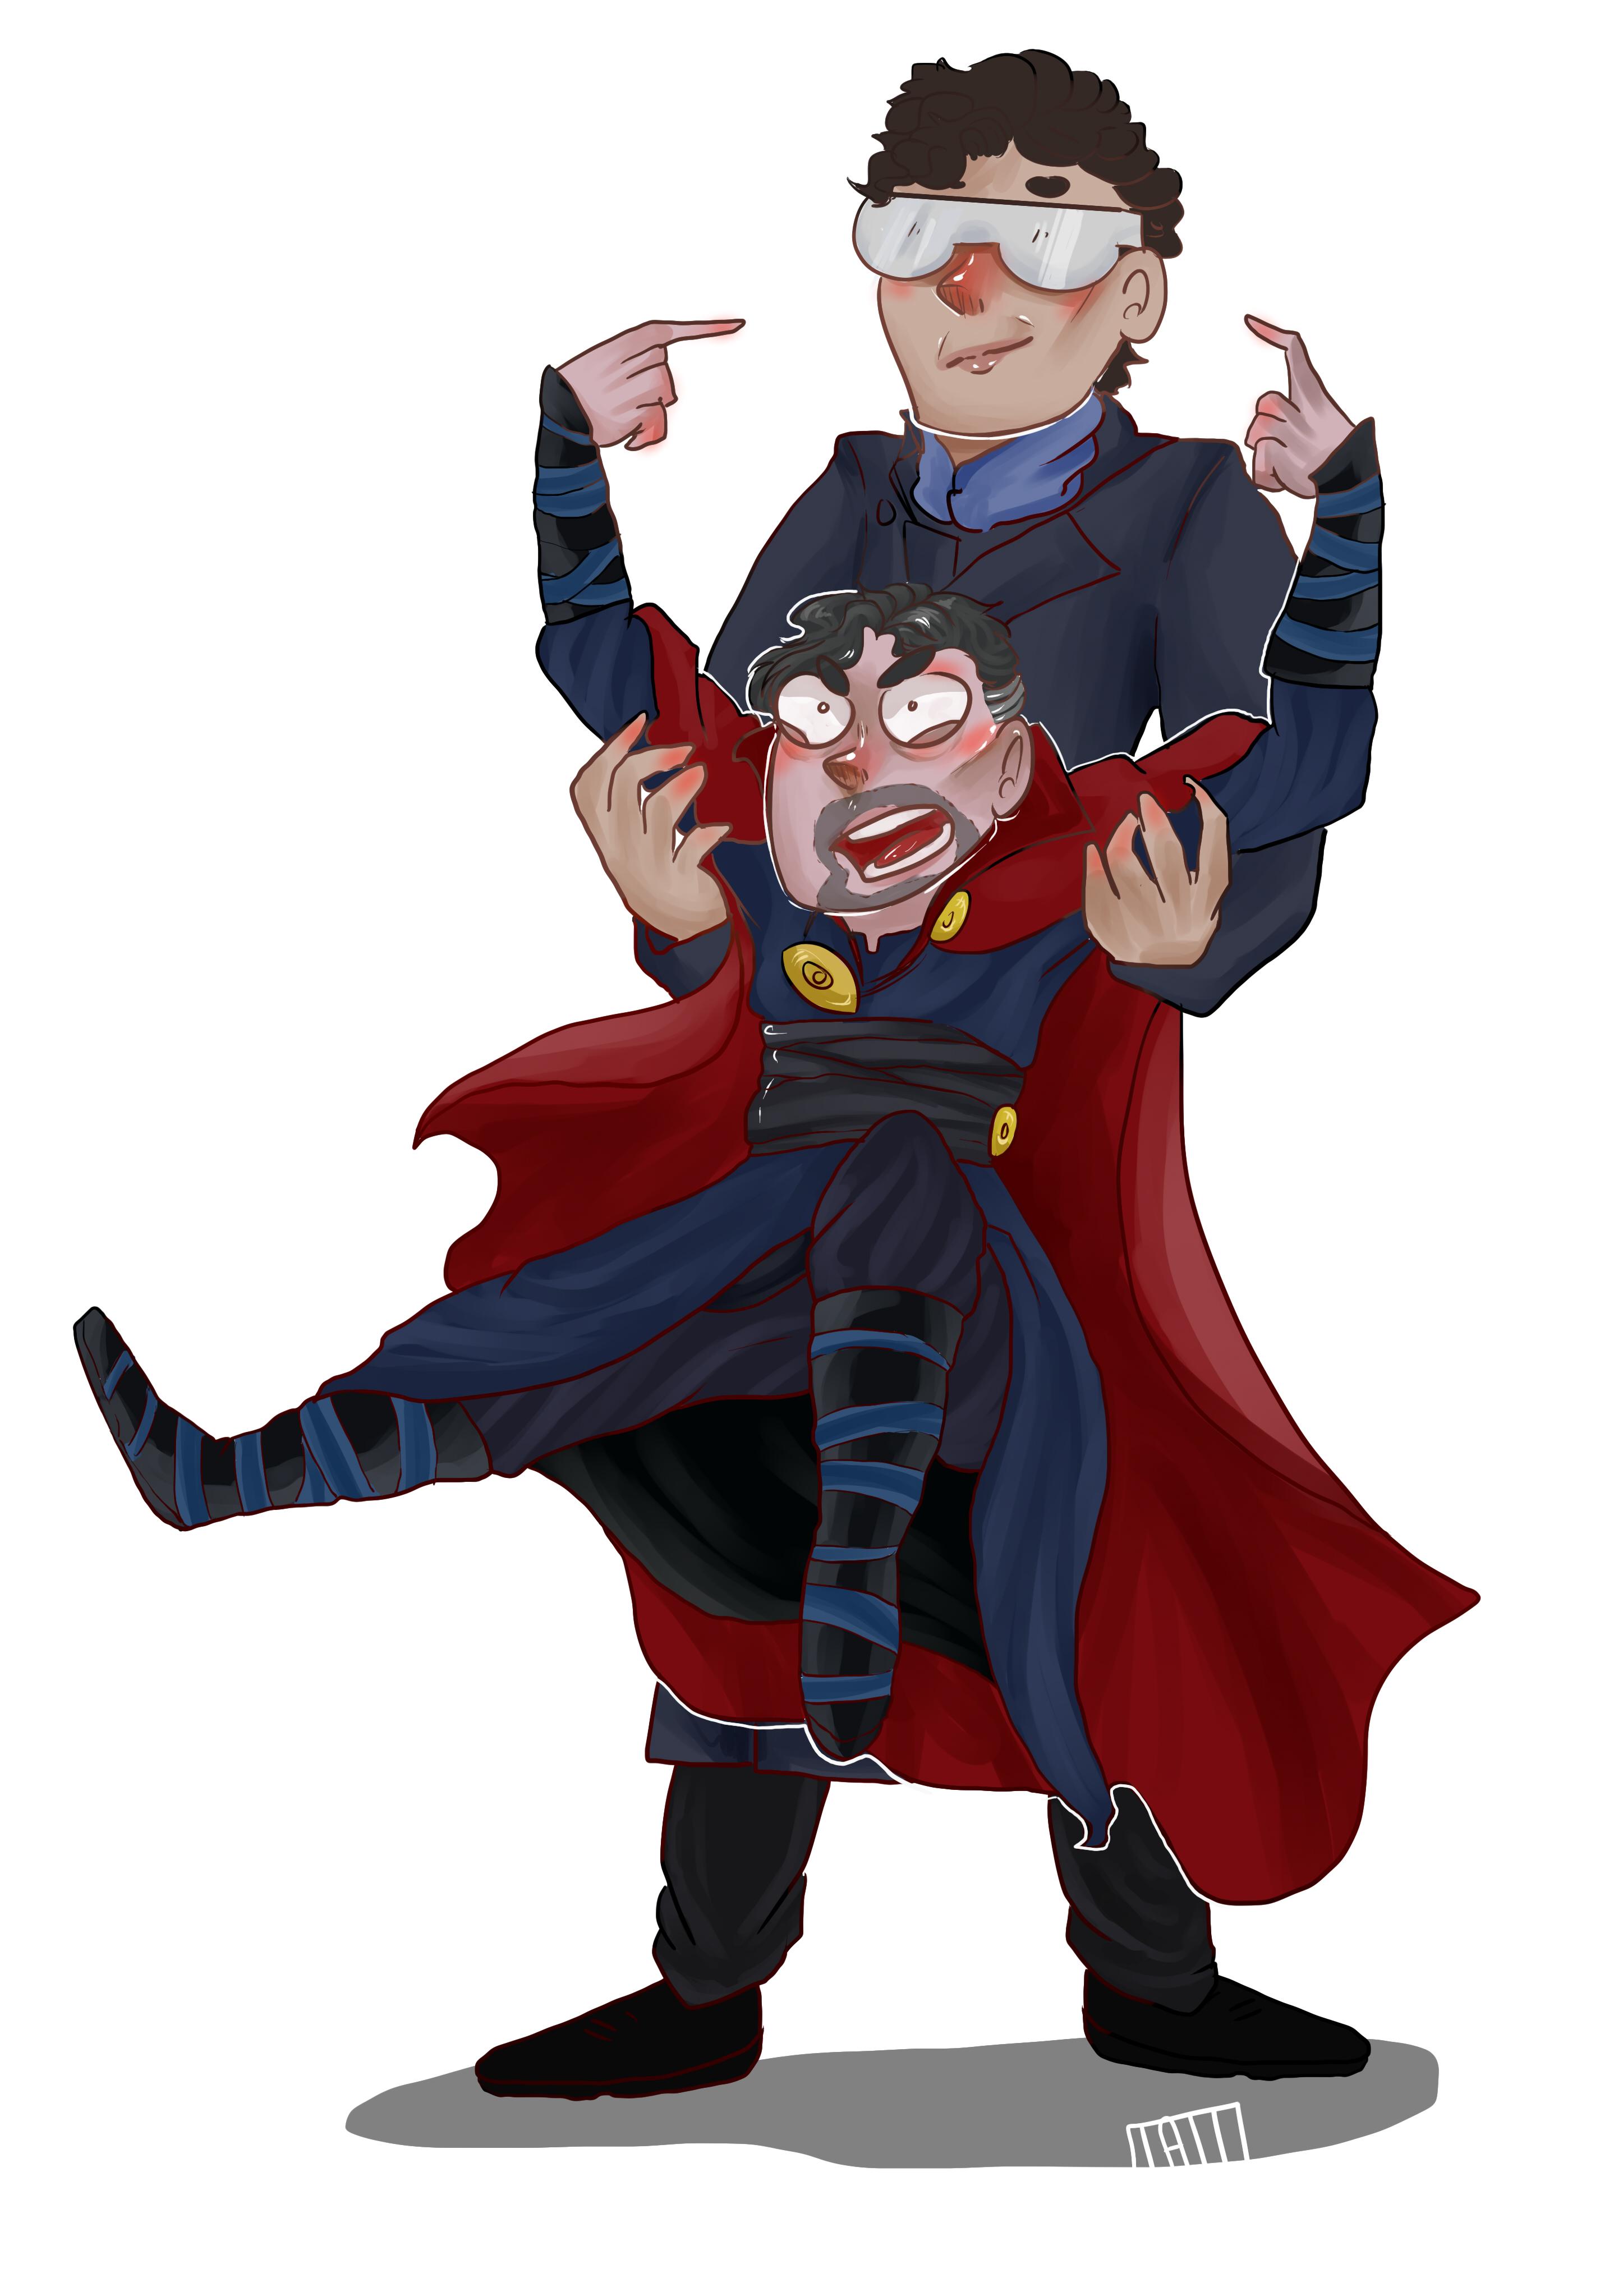 Dr Strange and Sherlock